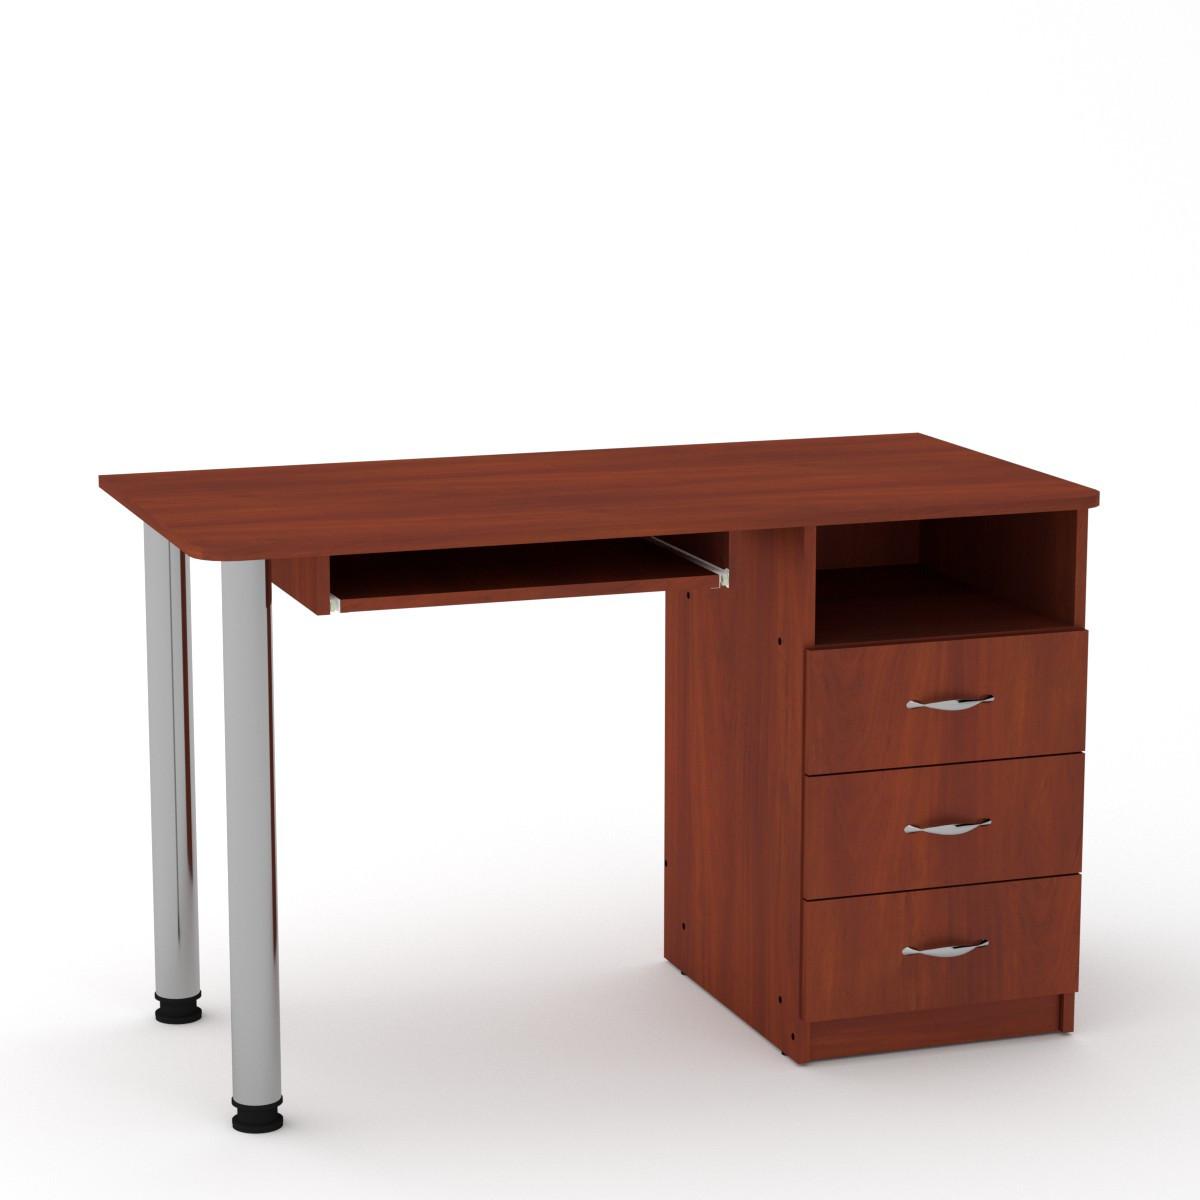 Стол письменный СКМ-9 яблоня Компанит (120х60х74 см)